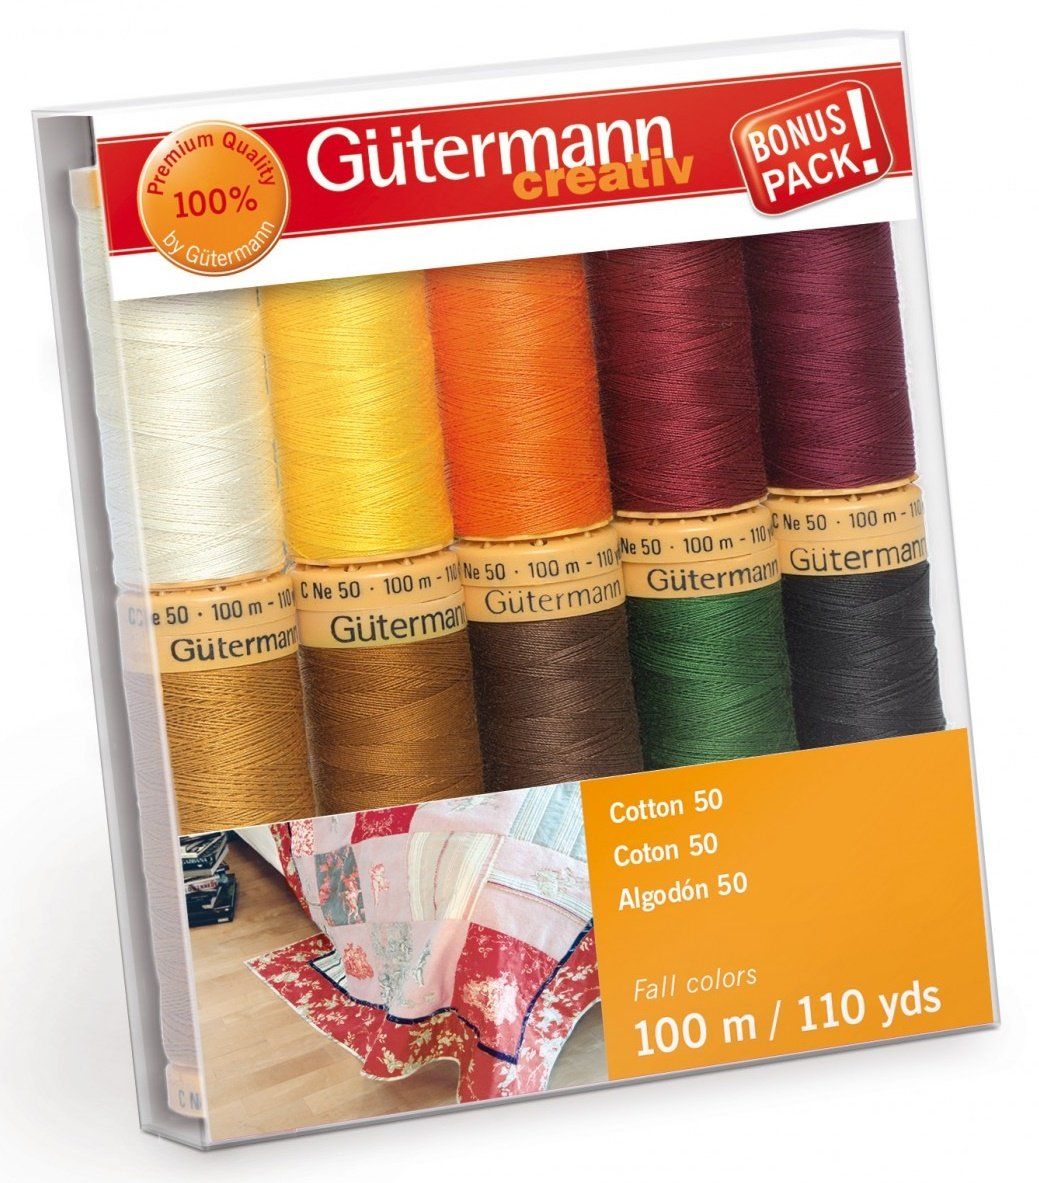 Gutermann Creativ Thread - 734016-2 Fall Cotton 50 - 10 Spools/10 Colors